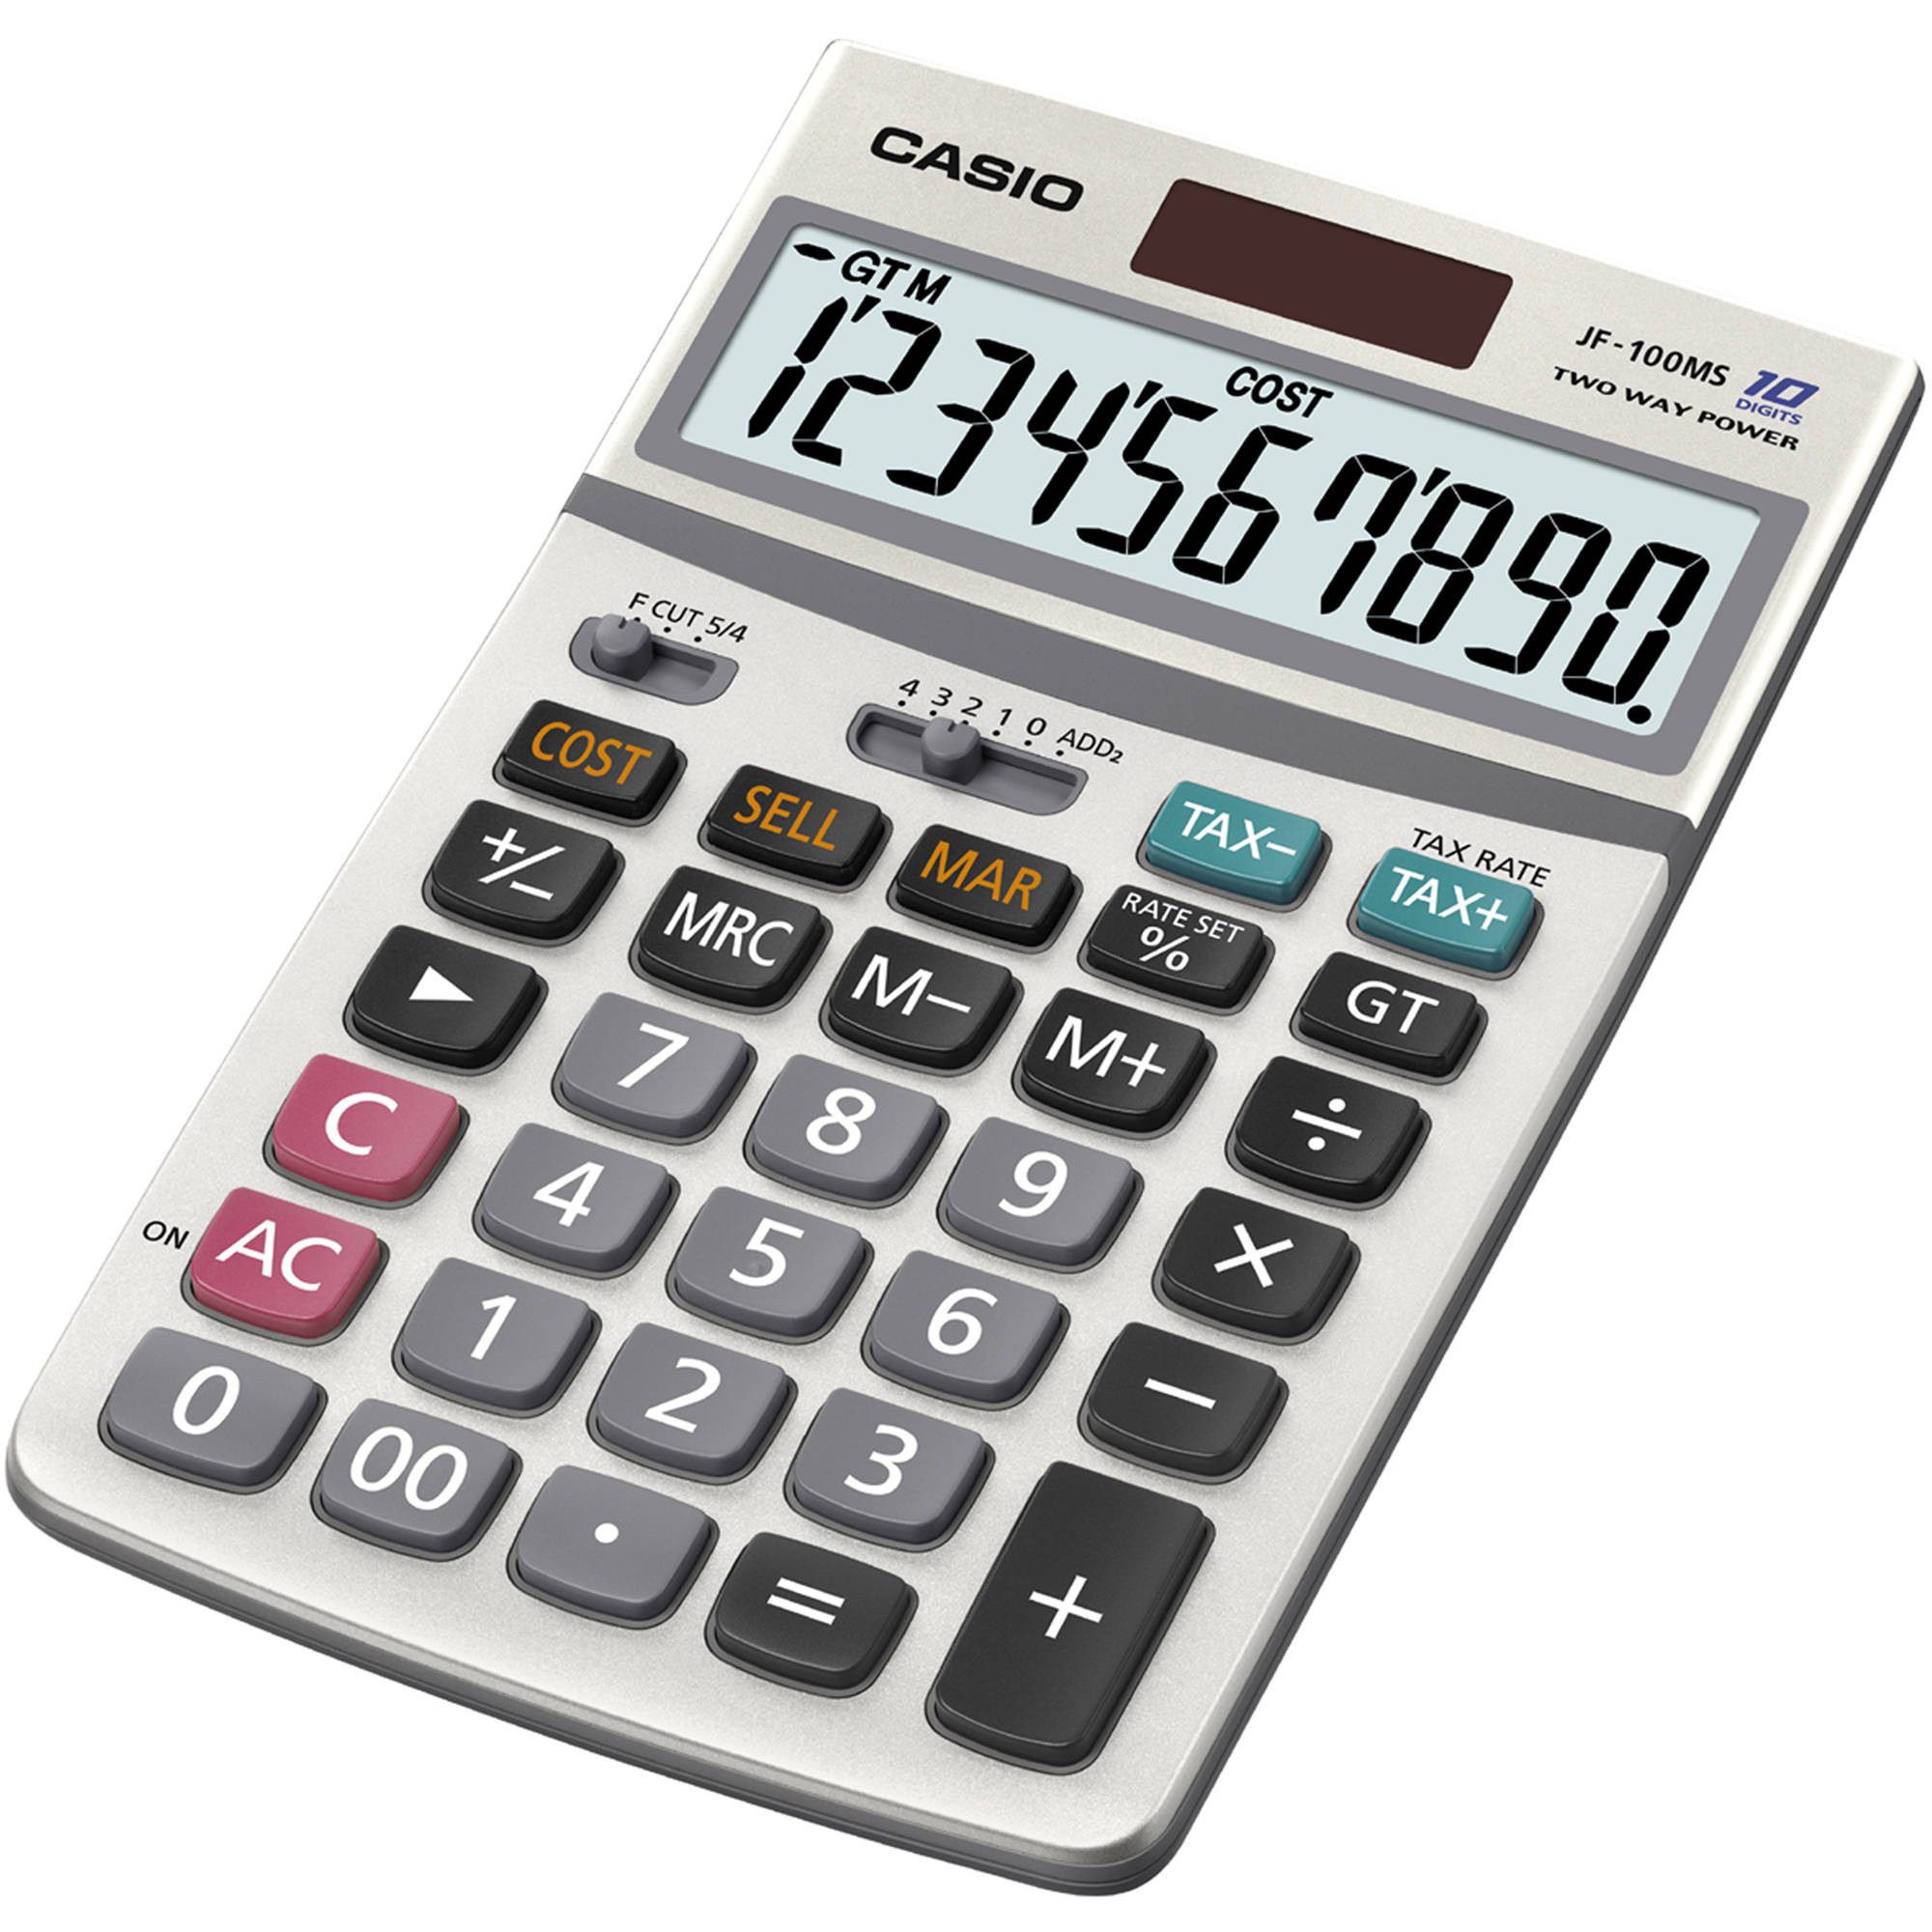 Casio SL-300SV Handheld Calculator